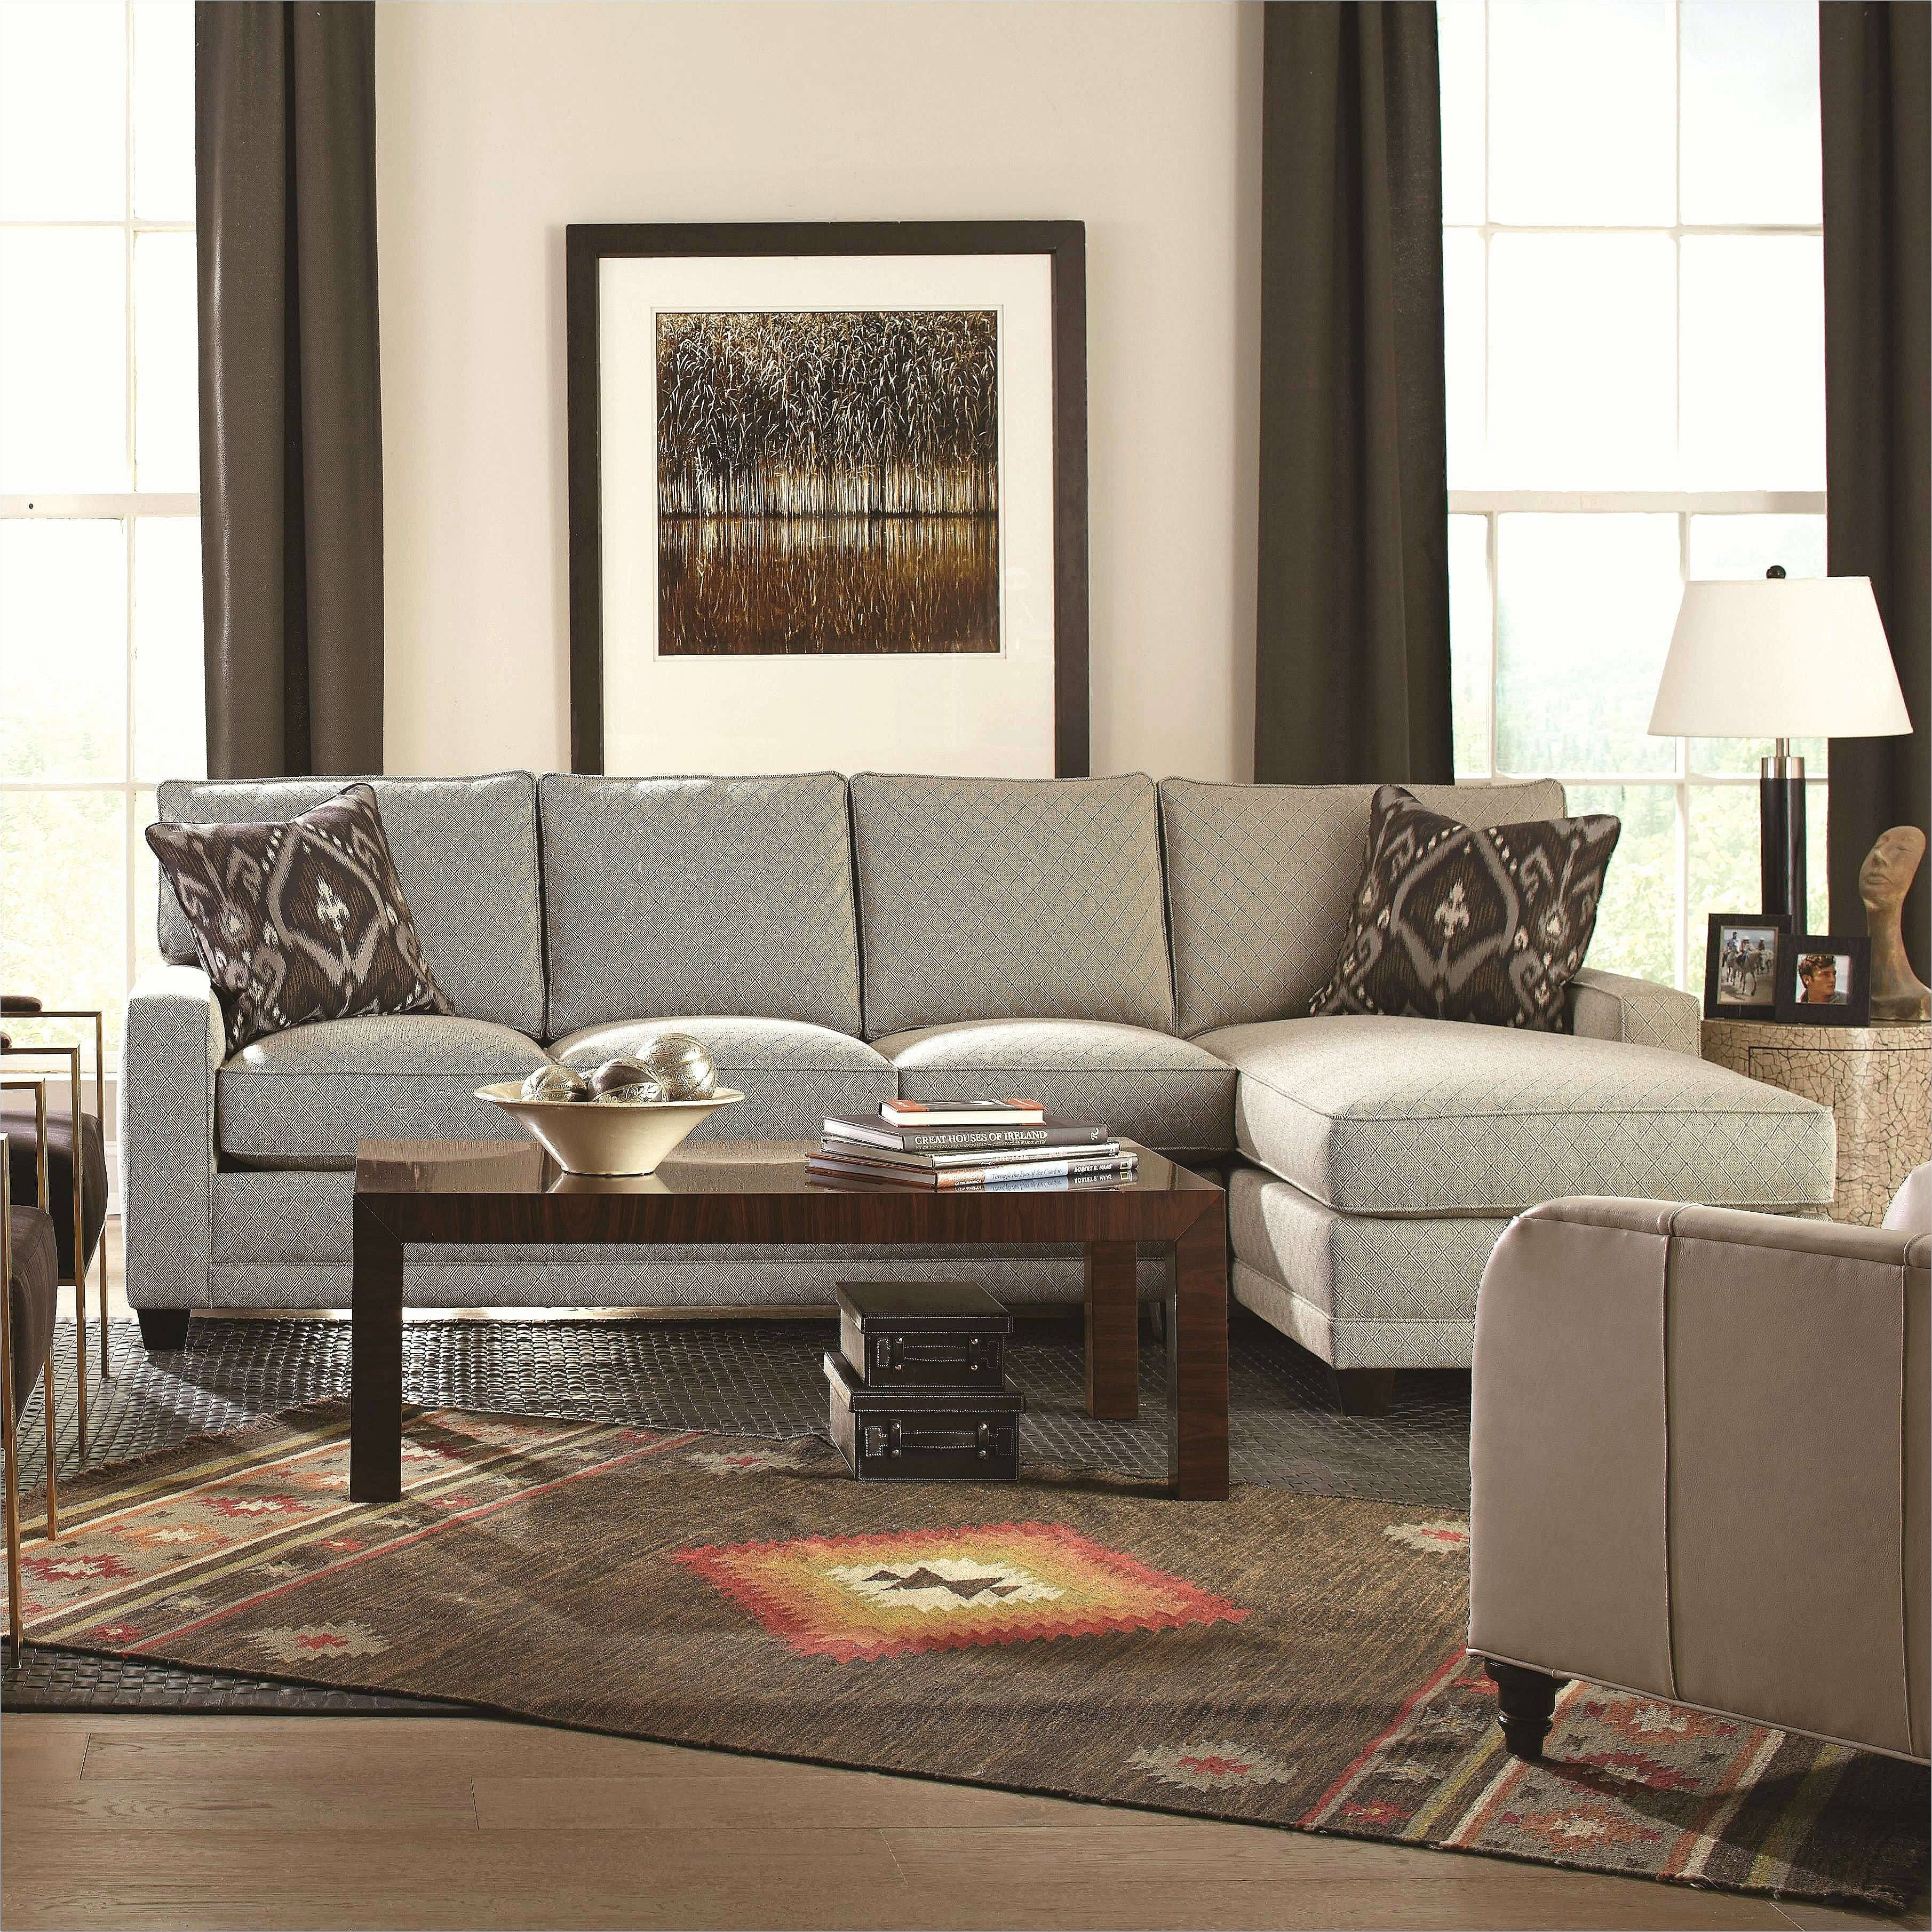 rustic living room furniture elegant modern living room furniture new gunstige sofa macys furniture 0d